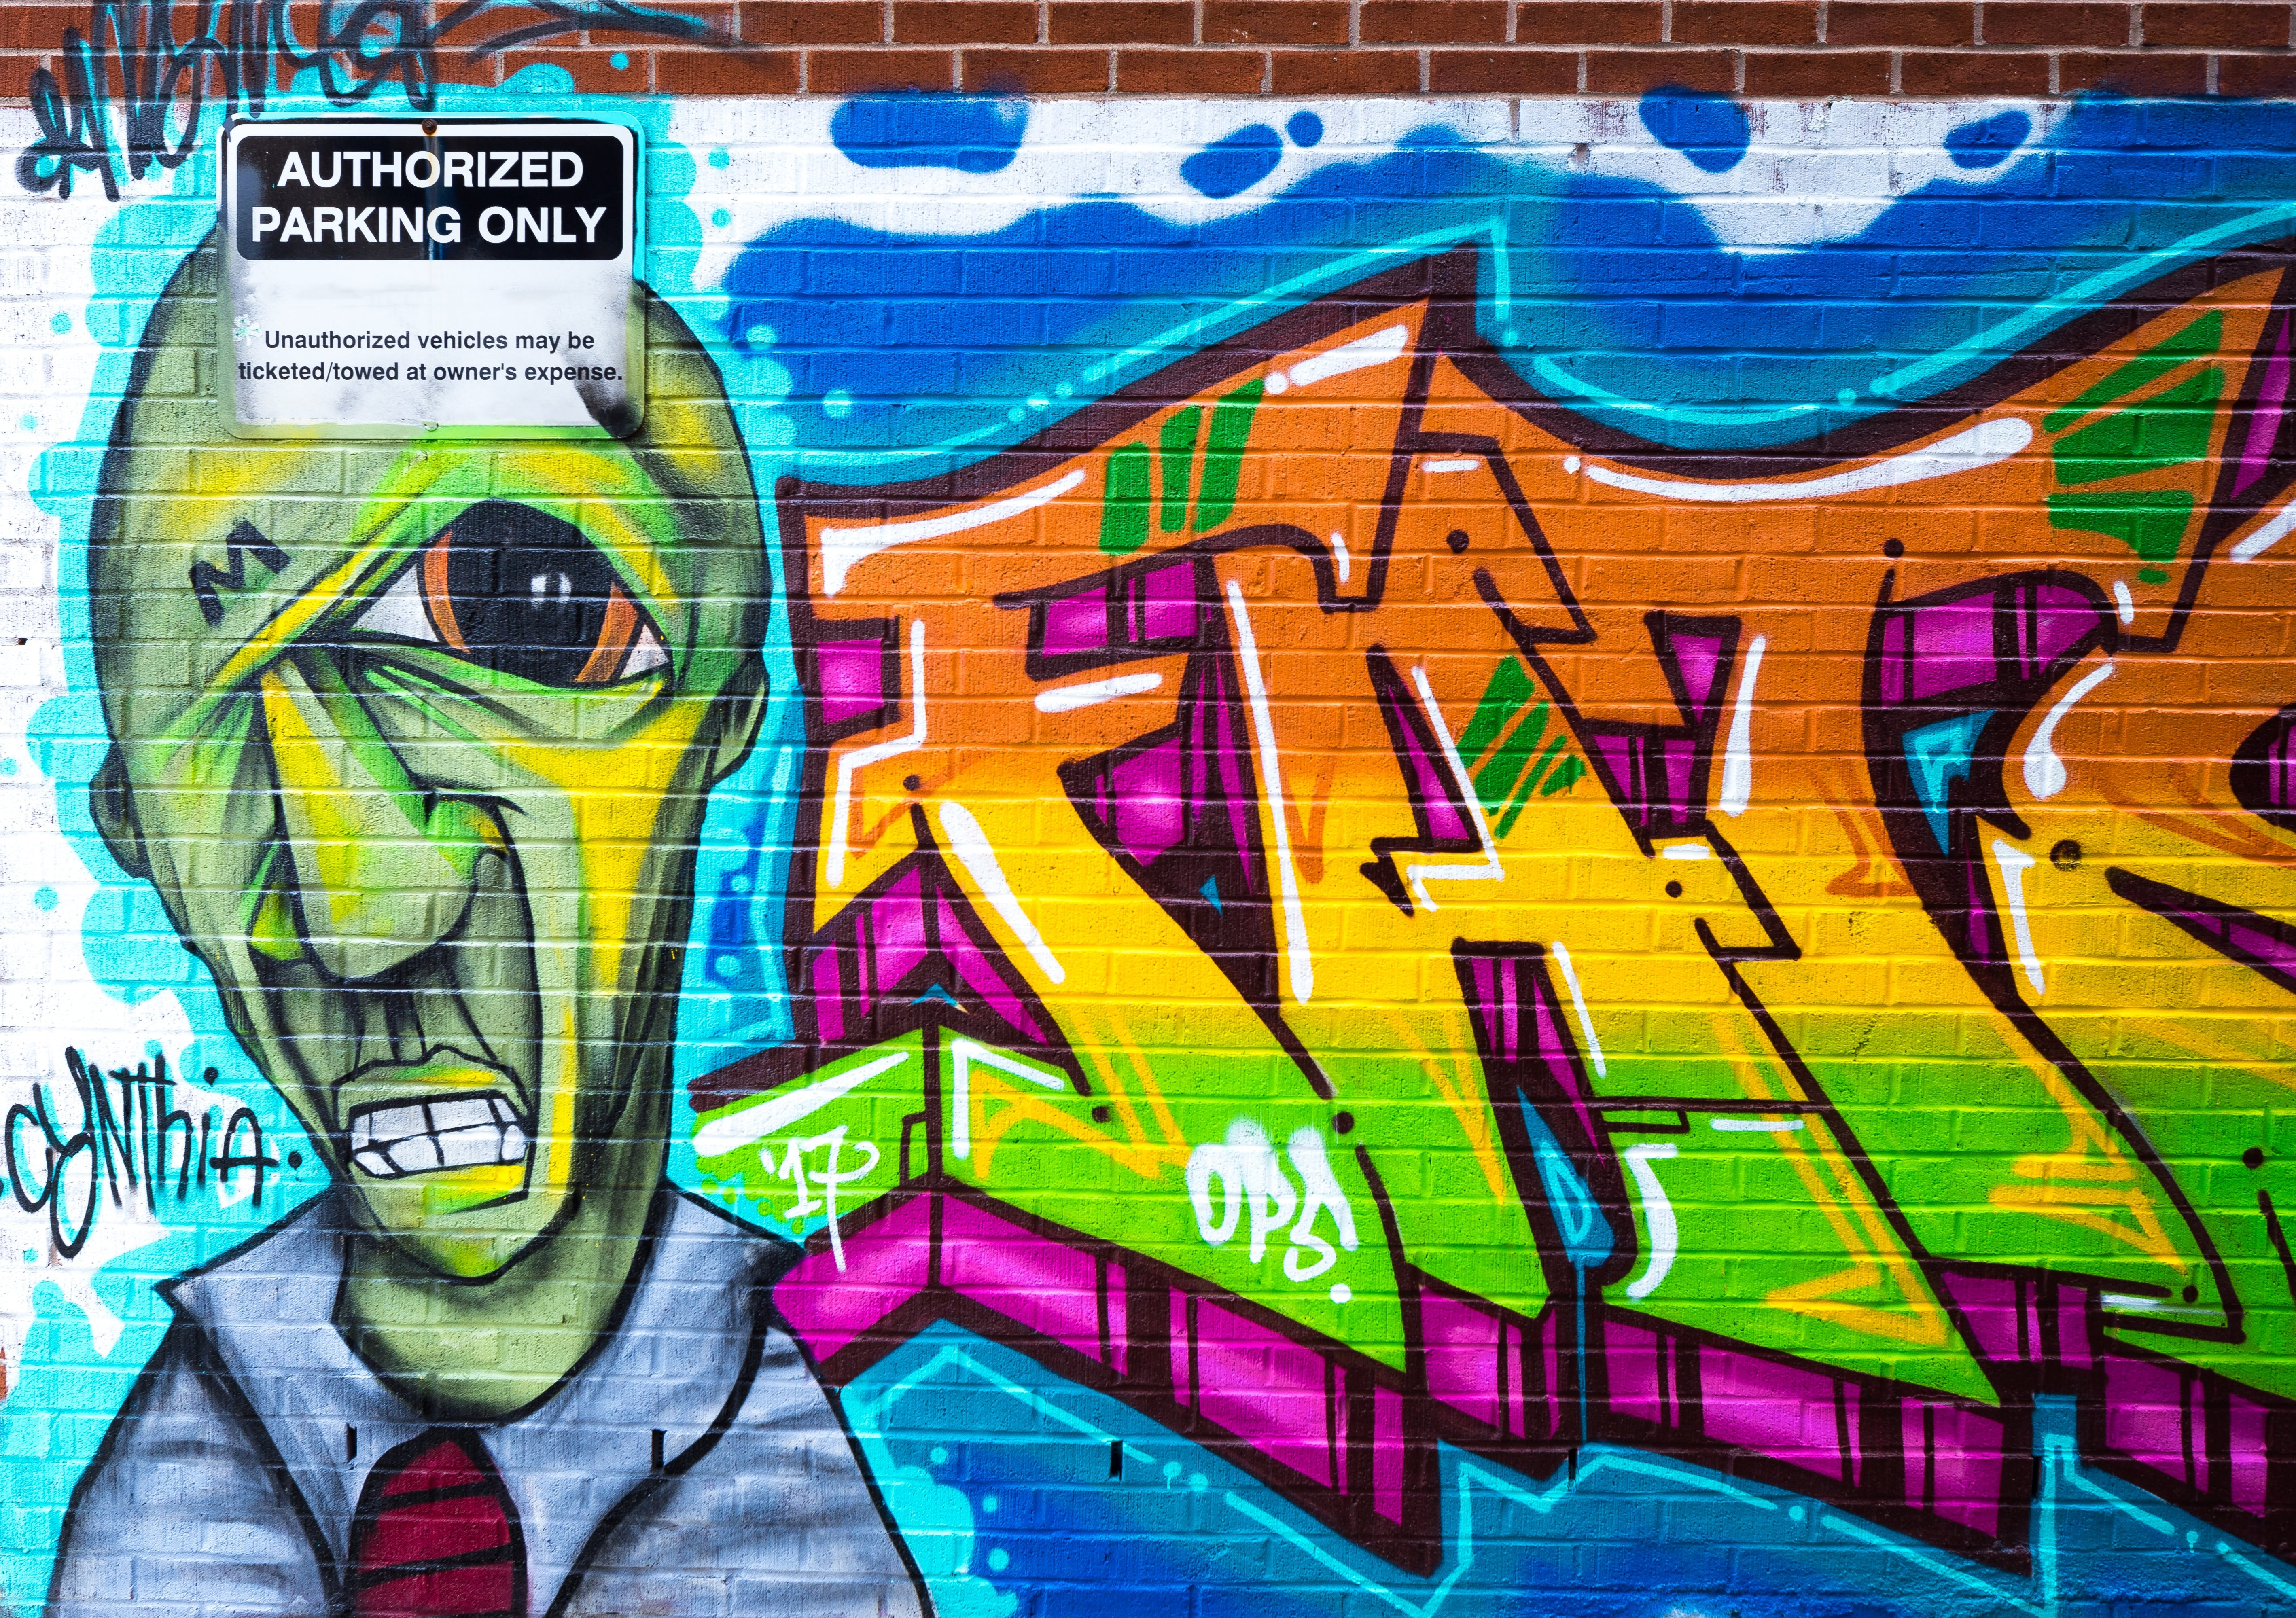 Photography of Brick Wall With Graffiti